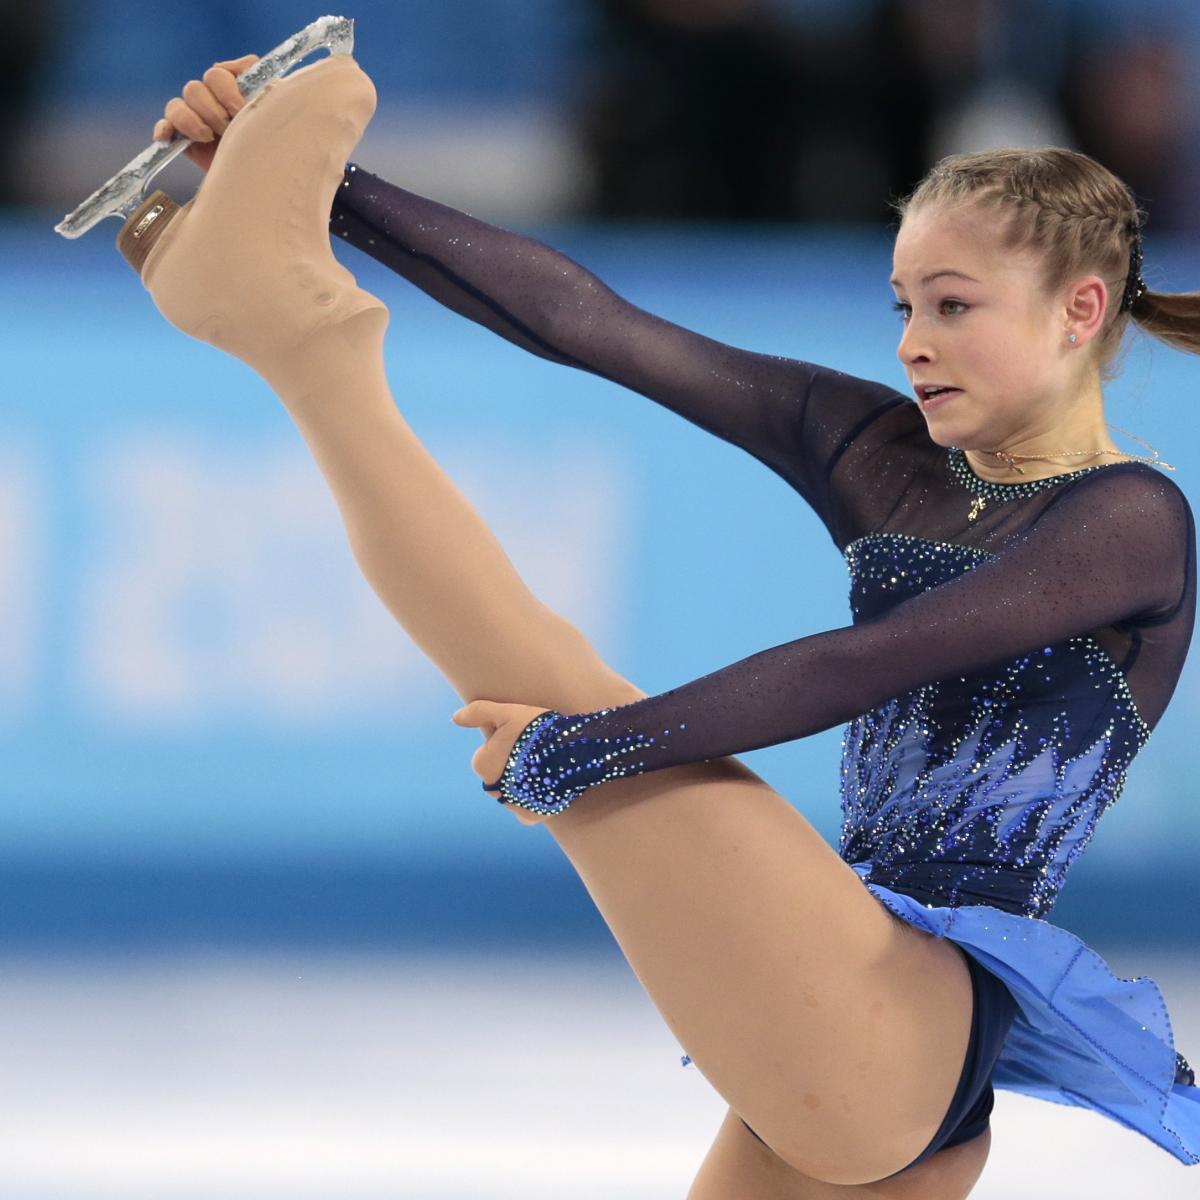 Russian Gold Medalist Figure Skater Yulia Lipnitskaya